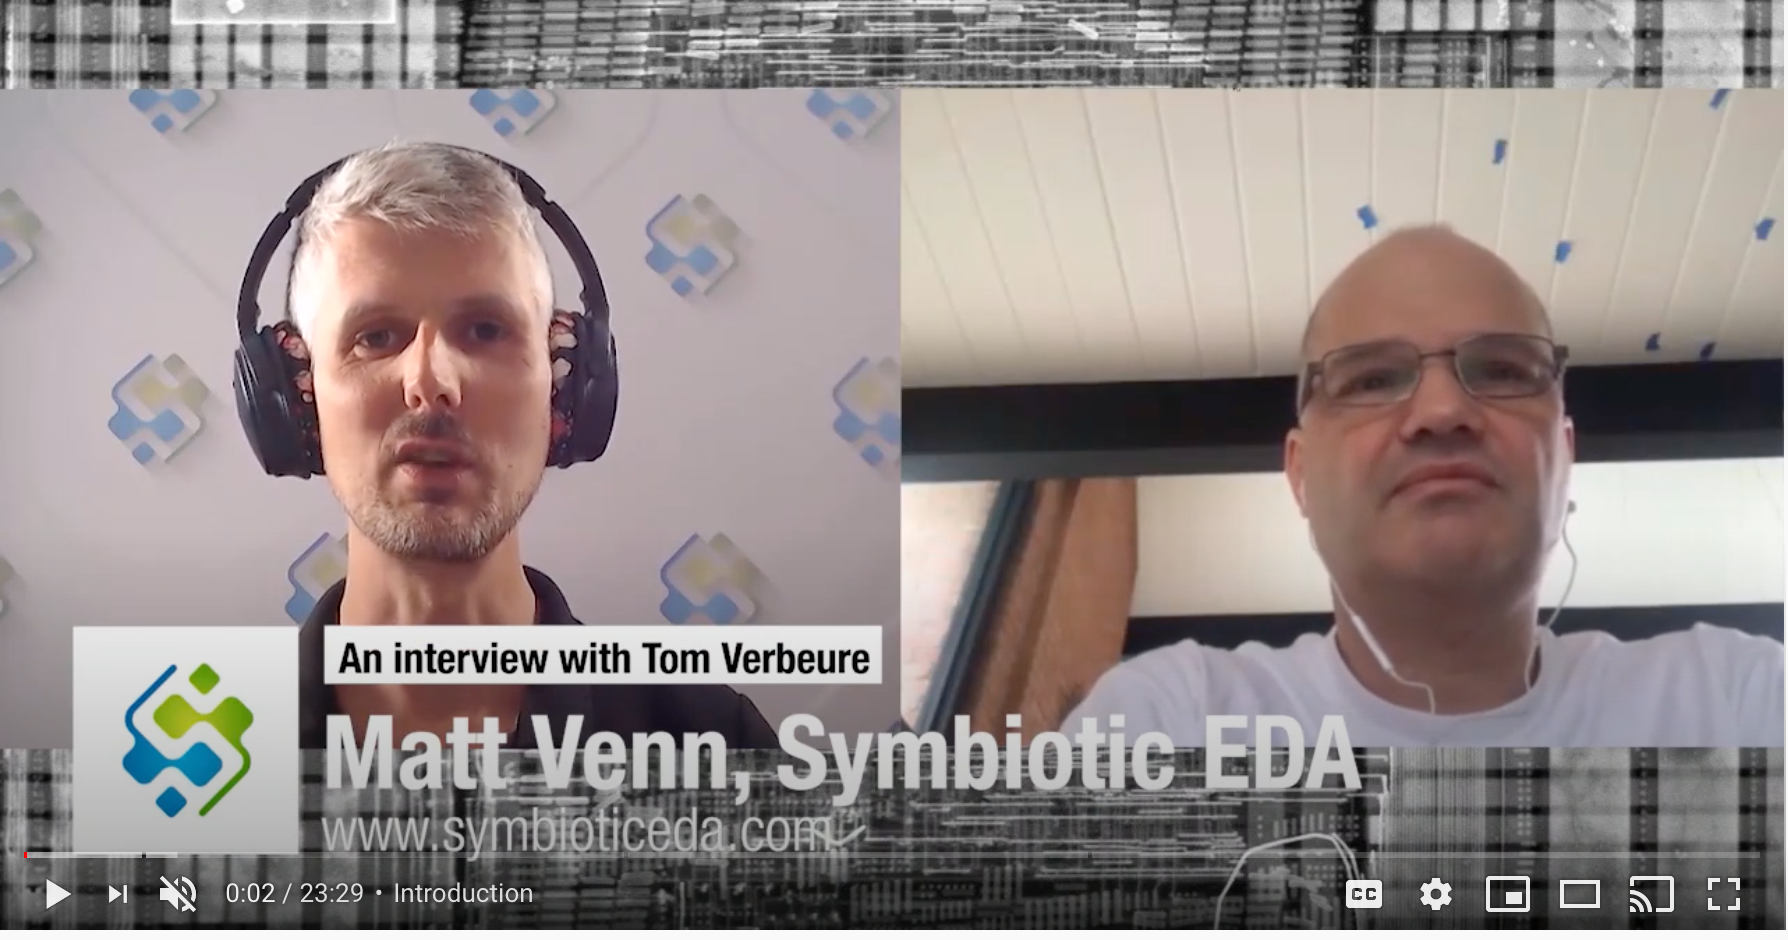 An Interview With Tom Verbeure: Phantom Packets, RISC-V, Under The Hood Of FV | Matt Venn, Symbiotic EDA (YouTube)